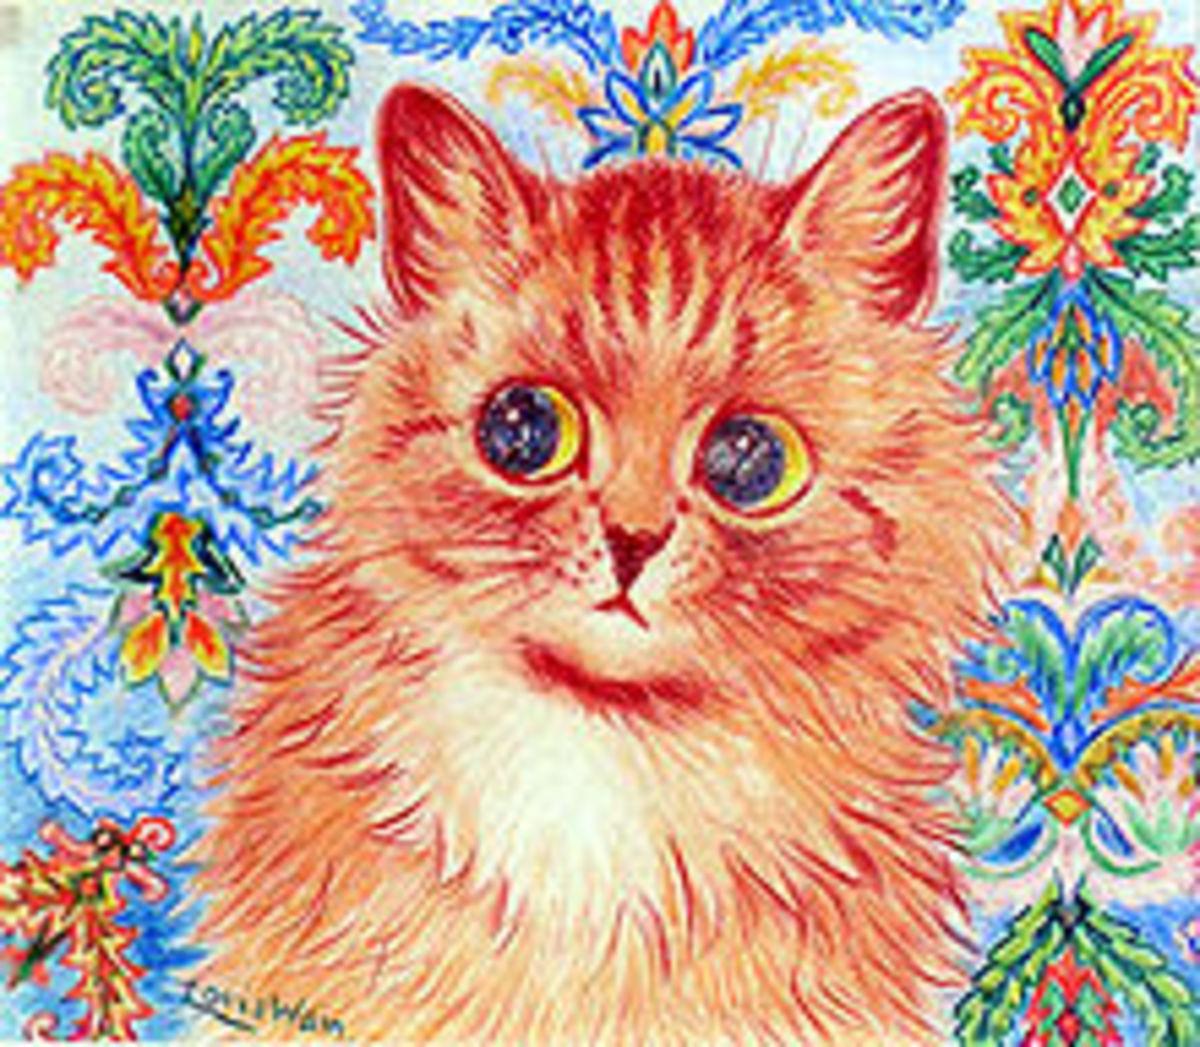 A disturbed Wain kitty